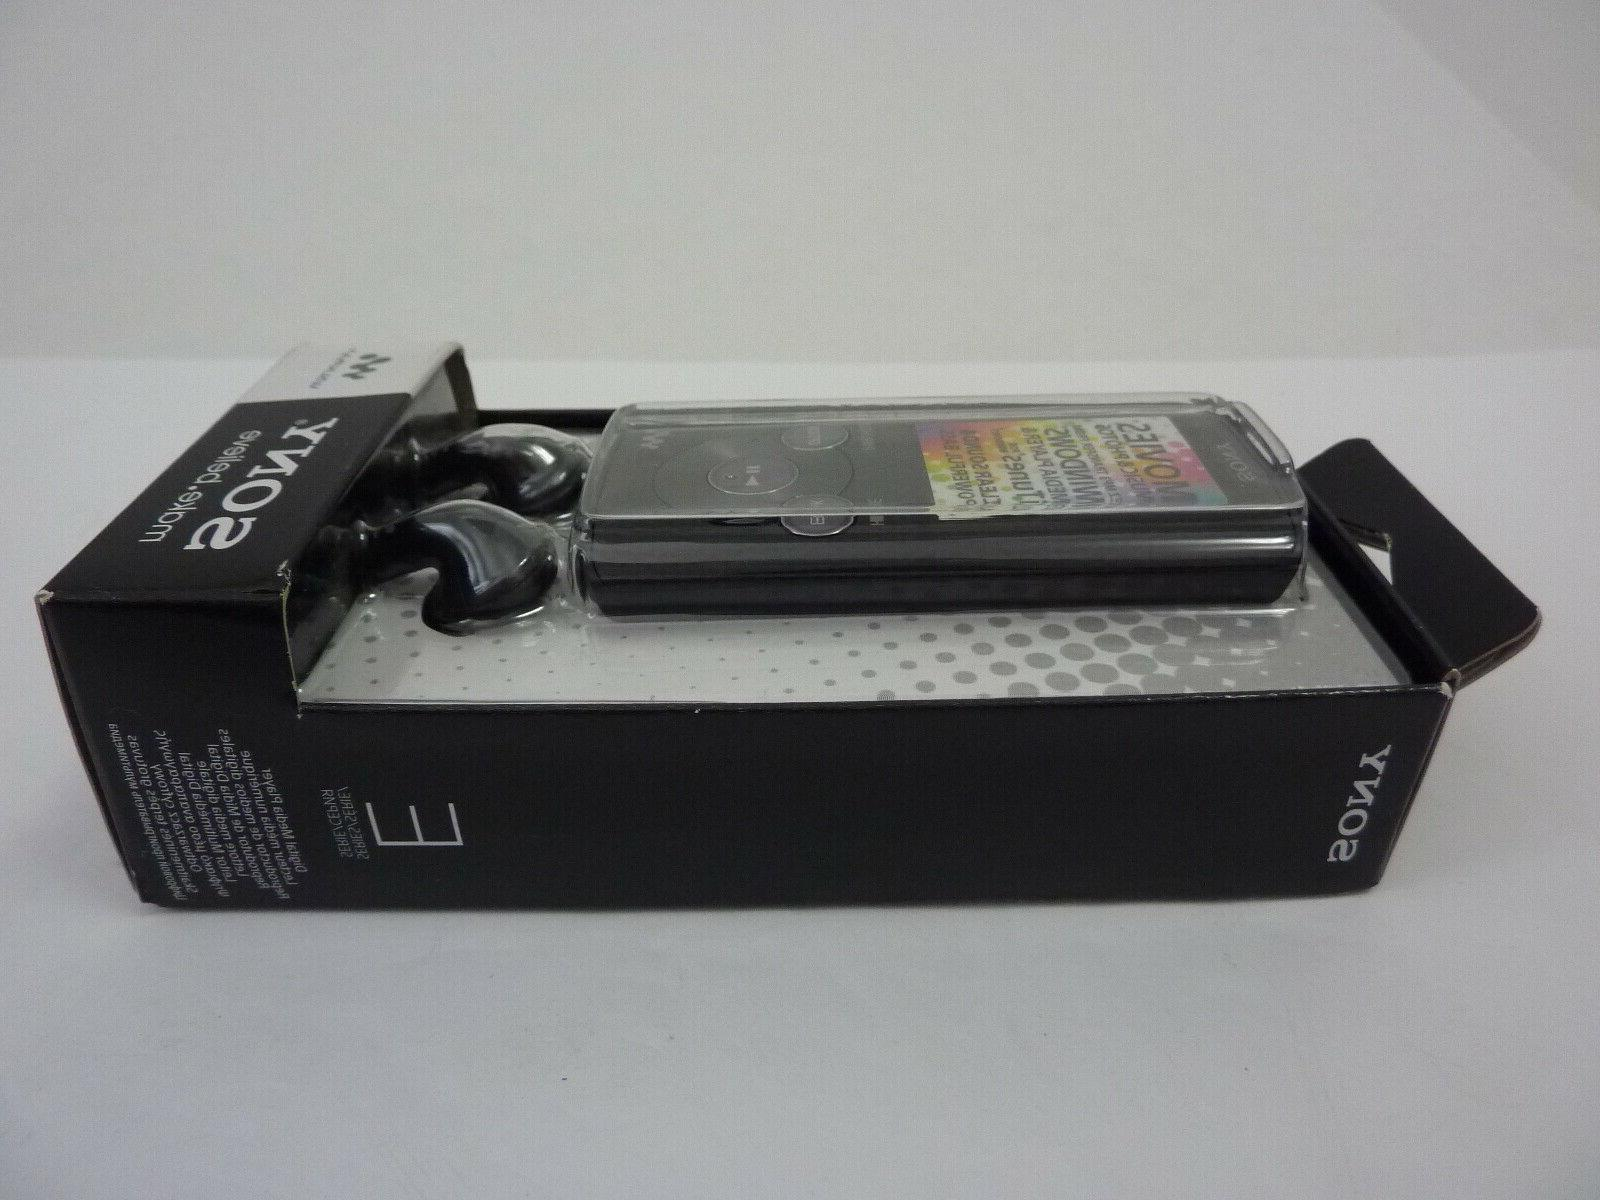 NEW - Sony NWZ-E384 MP3 Music Player Black 8GB SEALED